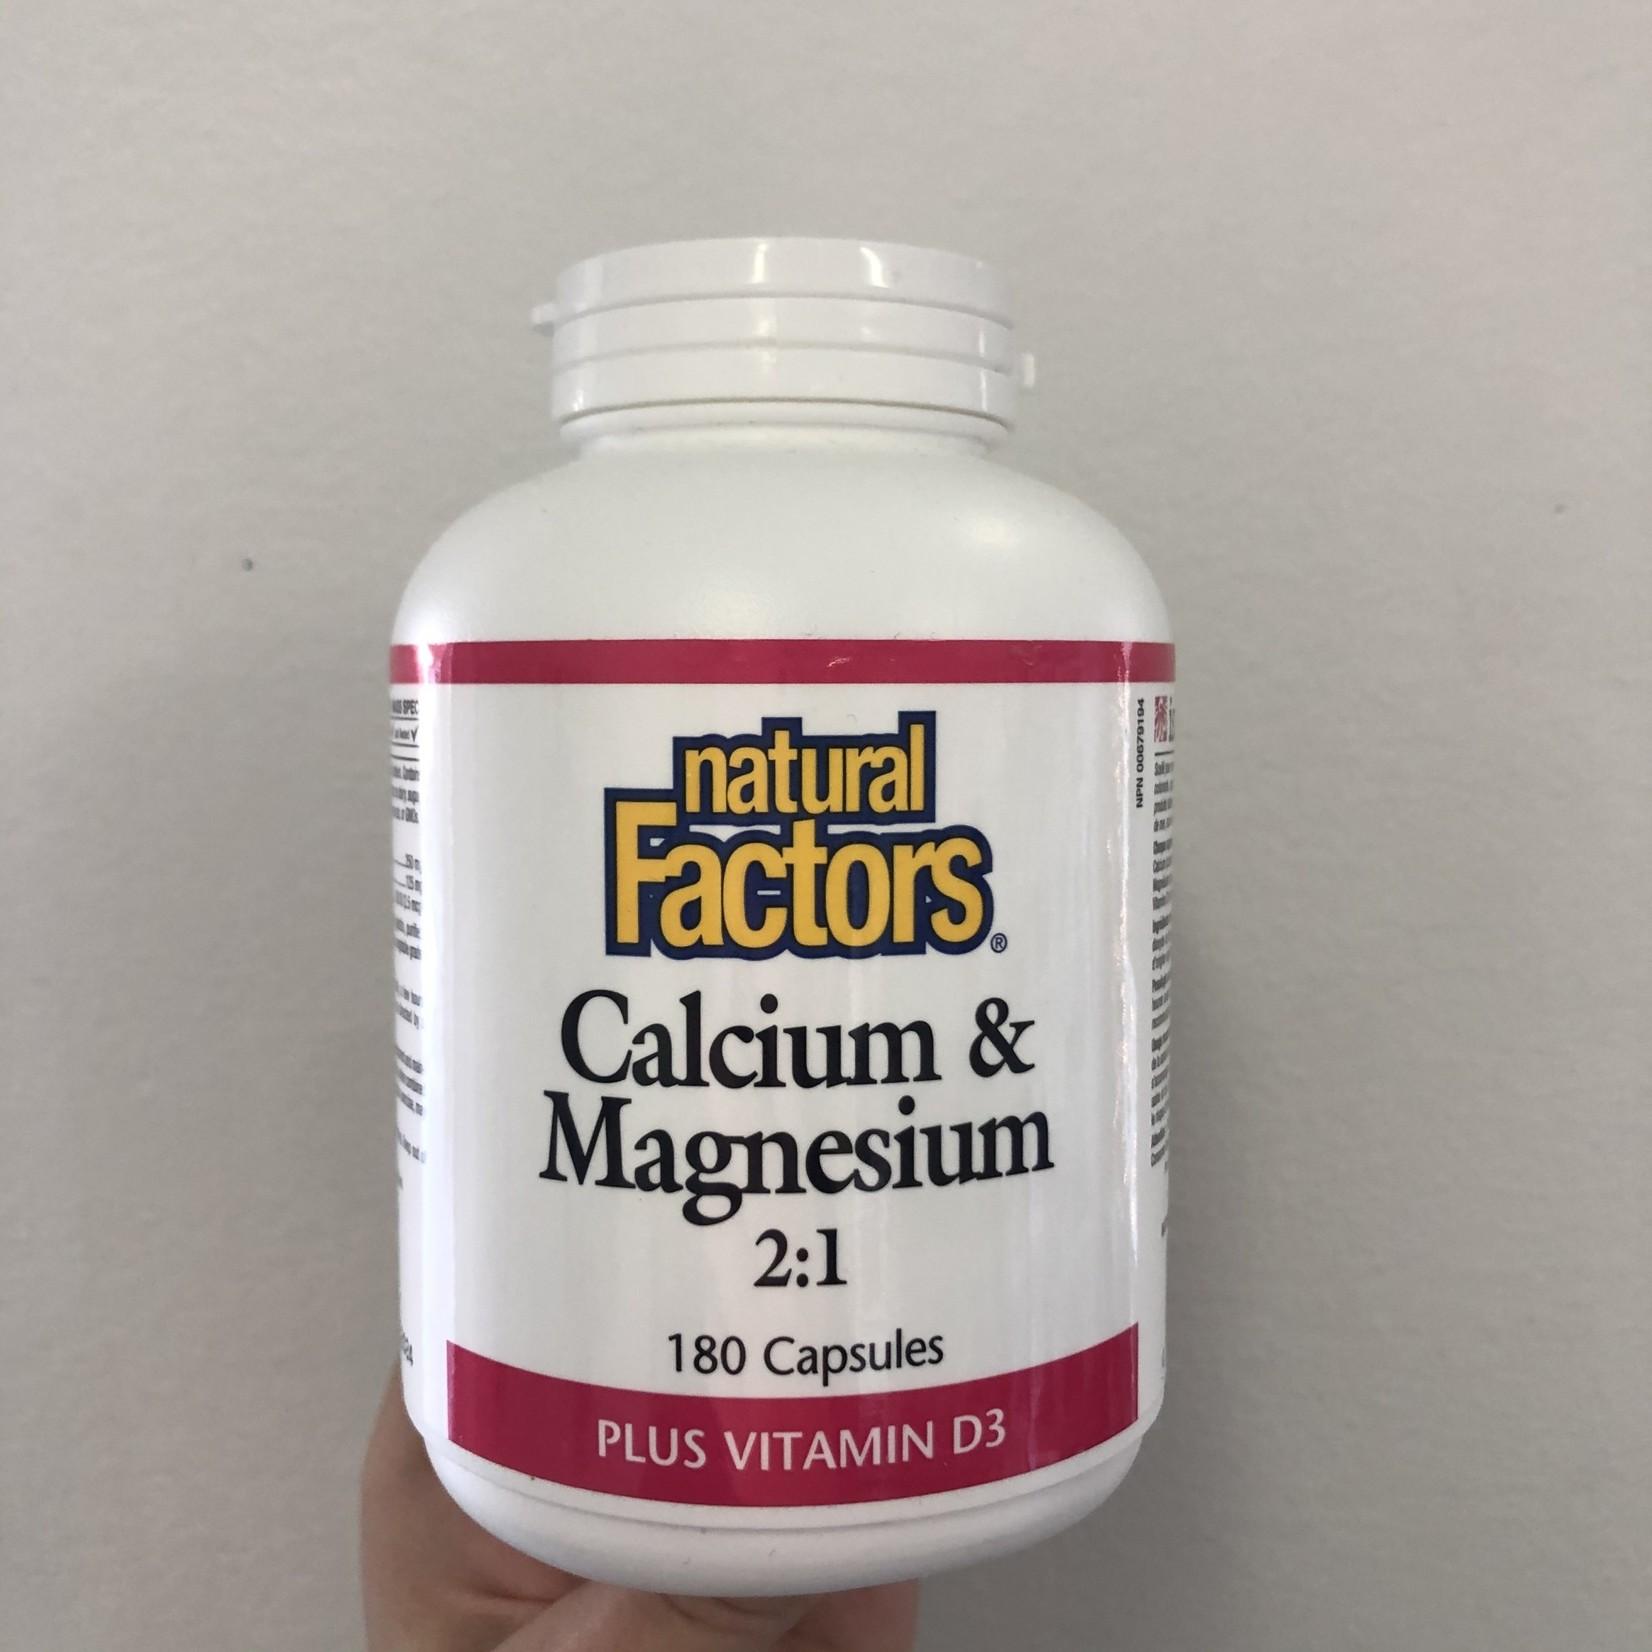 Natural Factors Natural Factors Calcium & Magnesium 2:1 Plus Vitamin D3 180 caps